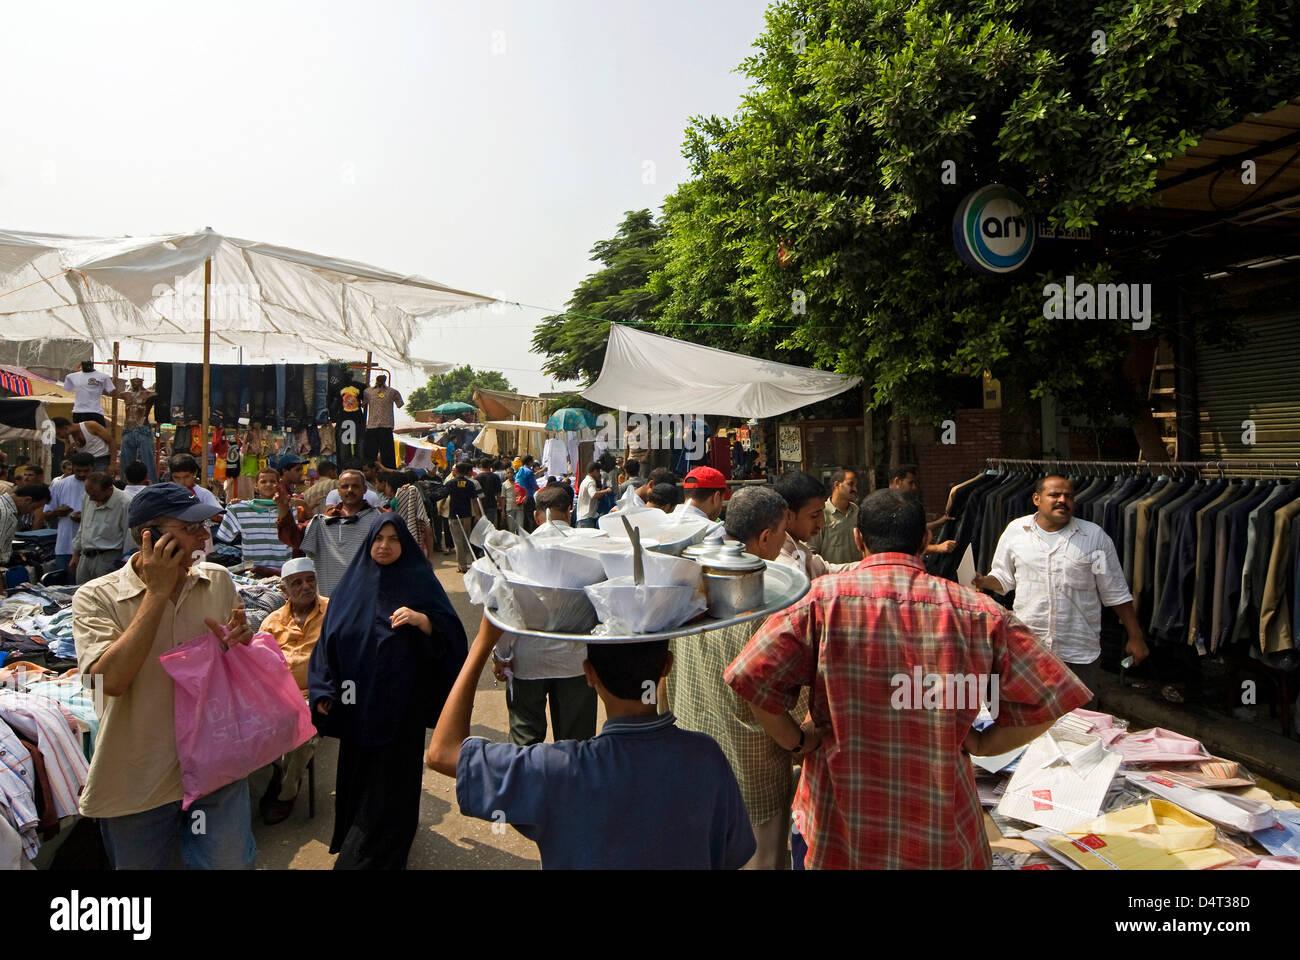 El Saida Ashah Market, City of the Dead Area, Cairo, Egypt. - Stock Image